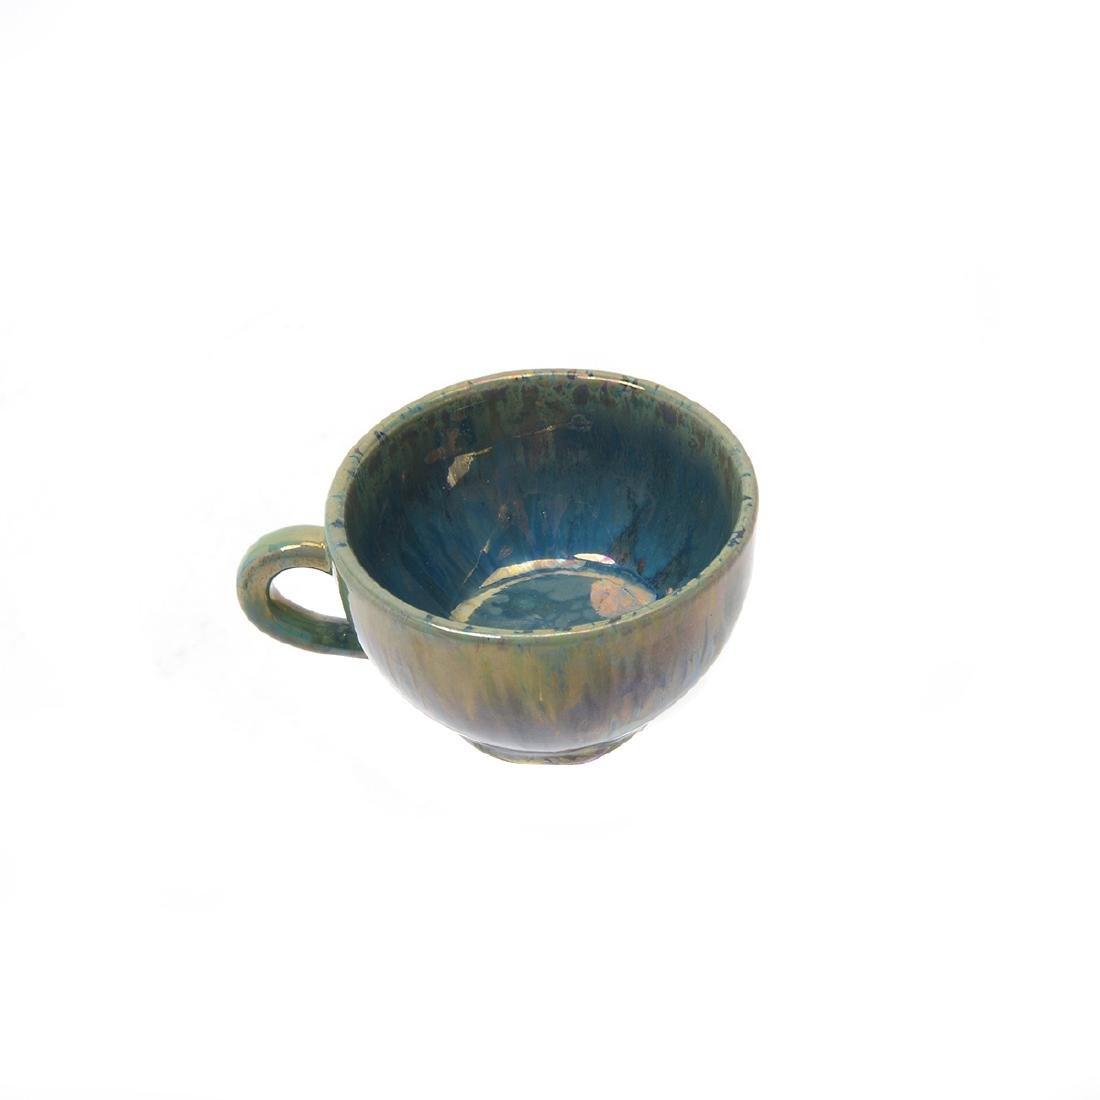 Alphonse Cytere Iridescent Art Pottery Tea Service - 10